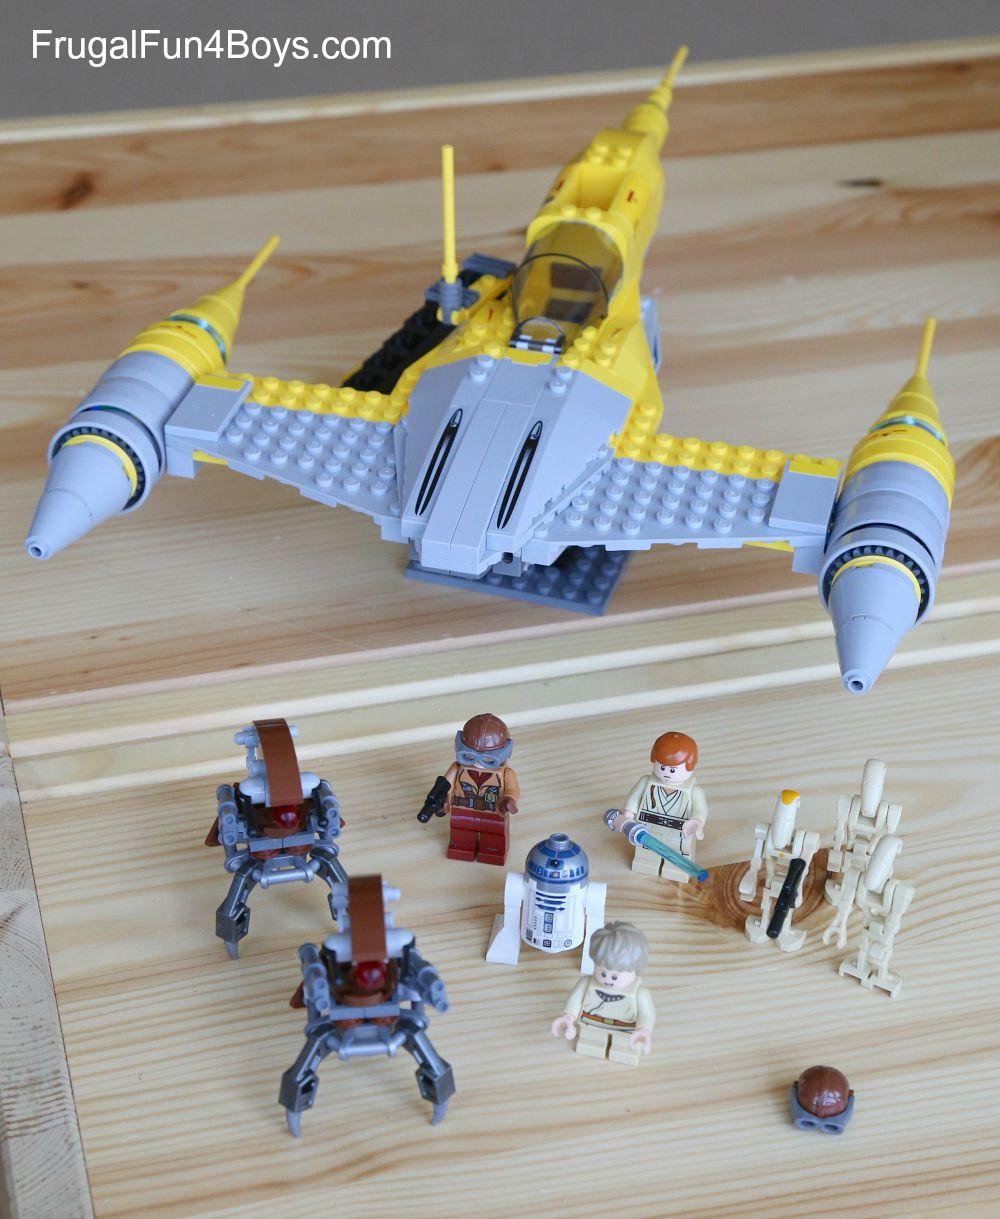 LEGO Star Wars Small World Play